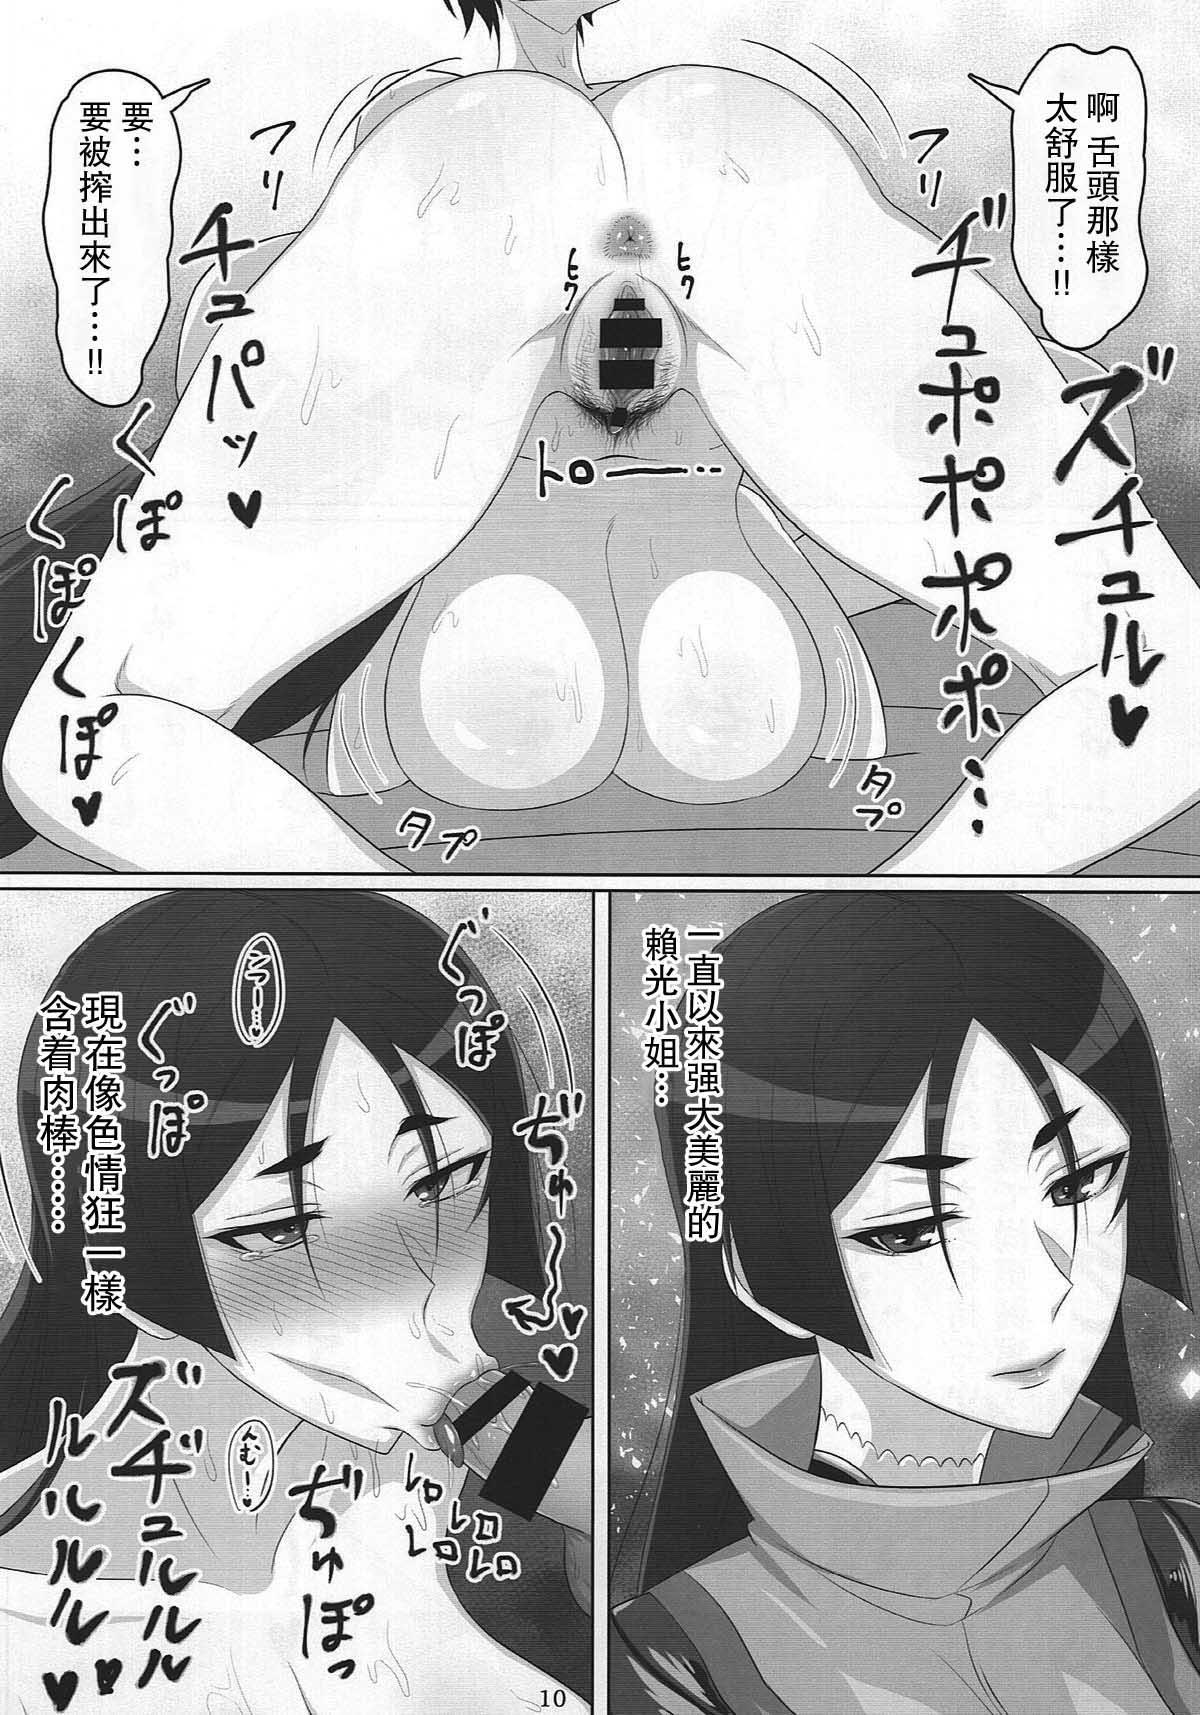 Awahime Raikou Hatsujou Catastrophe 7